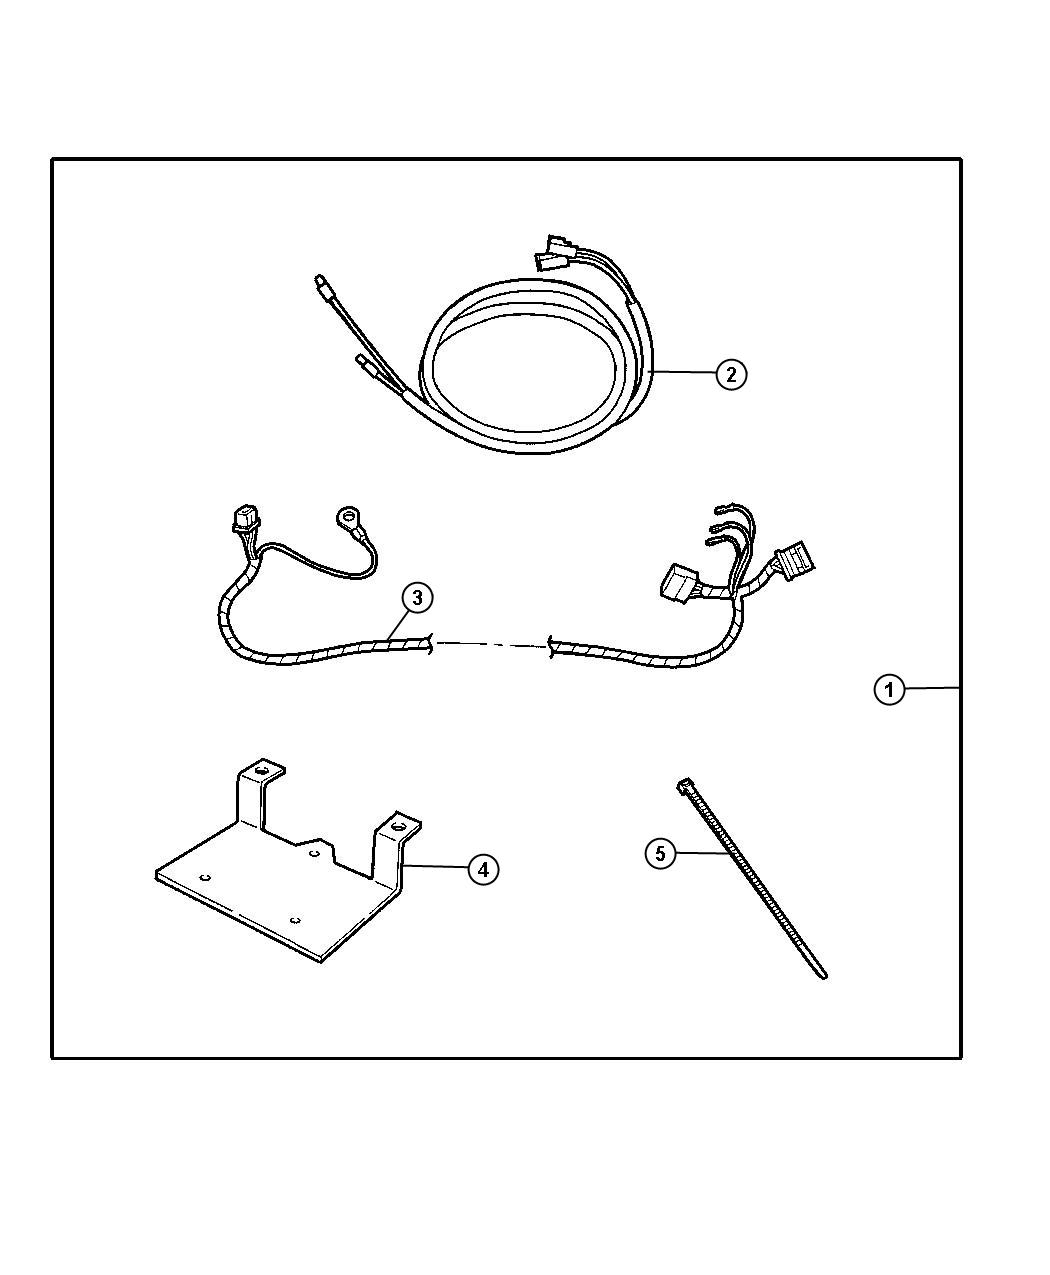 Dodge Ram 3500 Harness. Overlay. Kitsatellite, installl